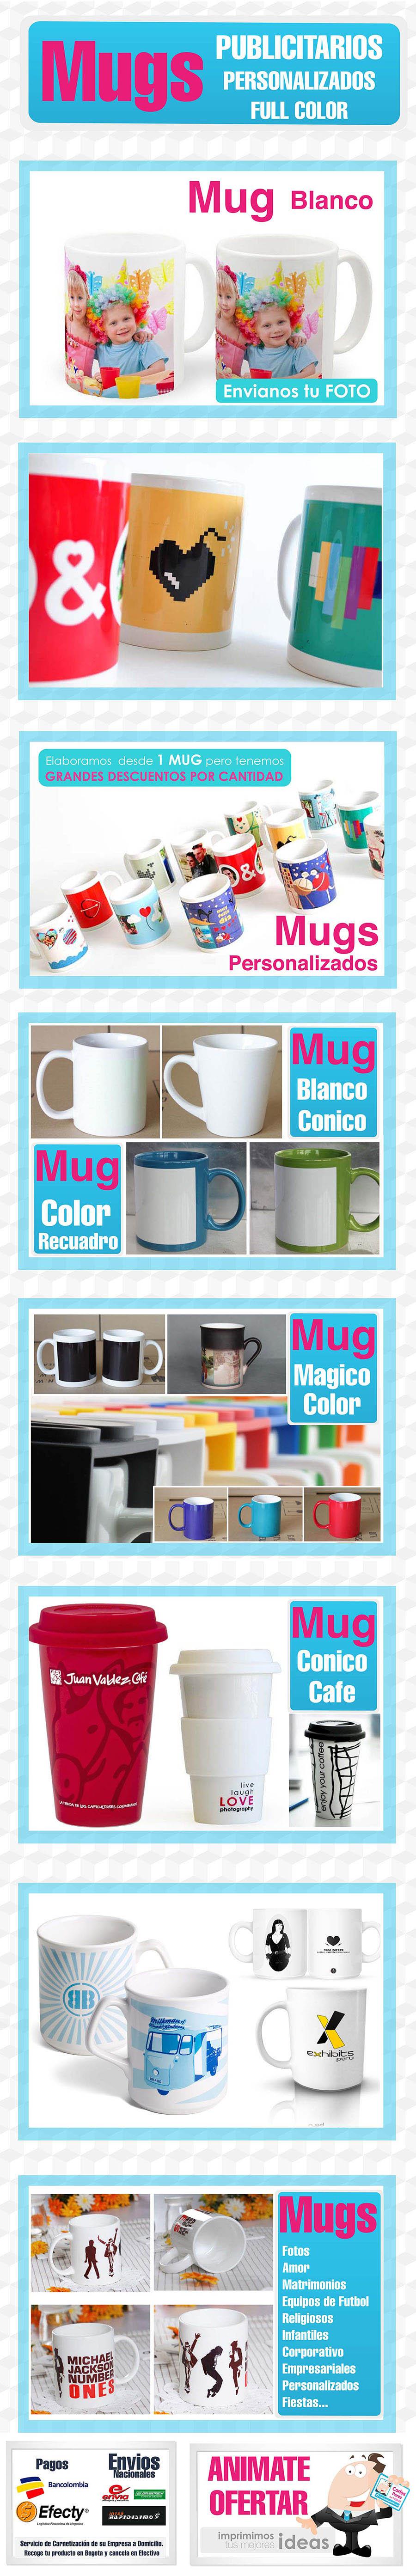 Mugs Mercado Libre